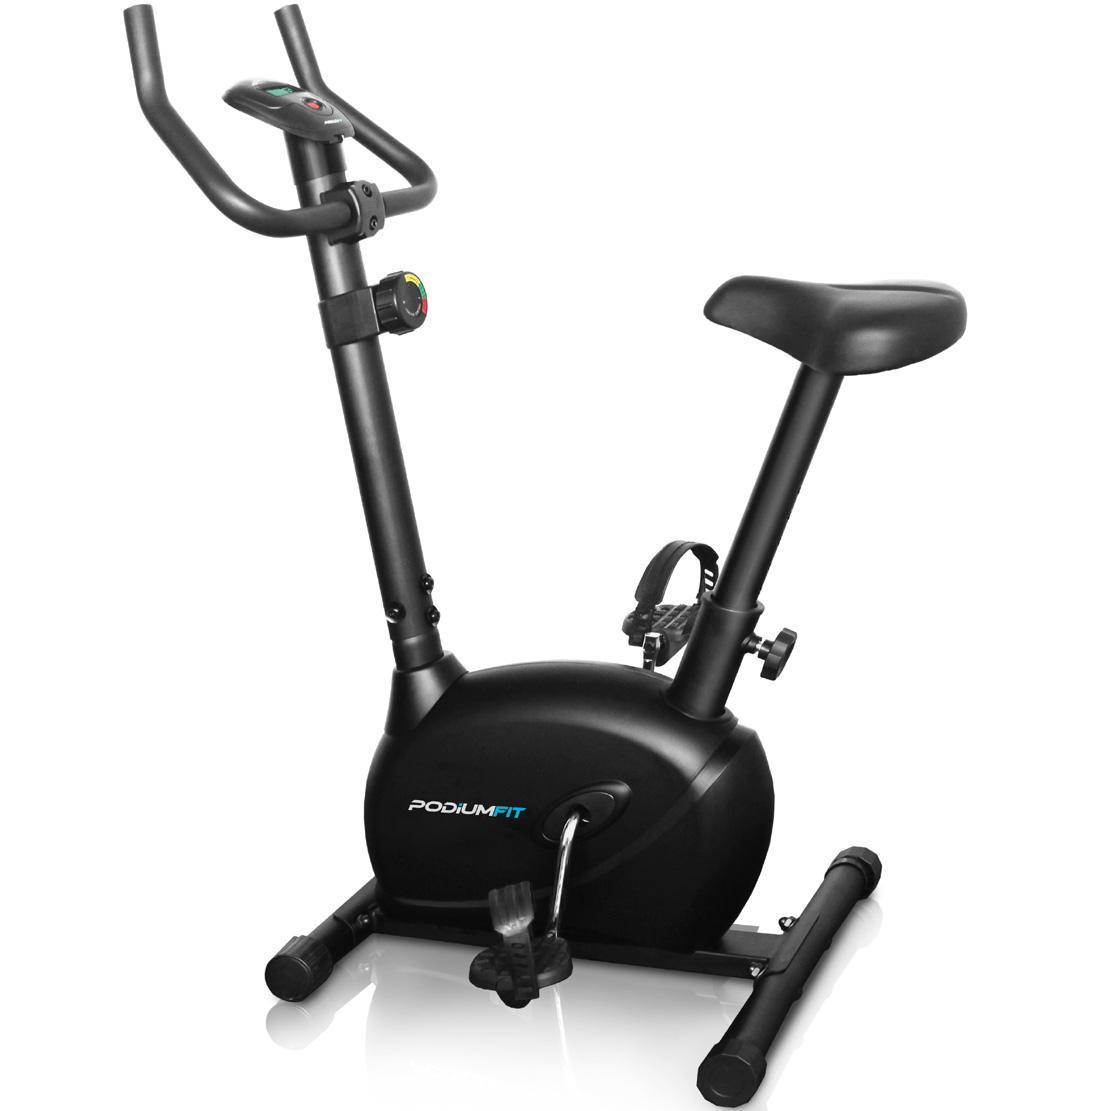 ea2ded054 Bicicleta Ergométrica Podiumfit V100 Magnética 8 Cargas - Bicicleta ...